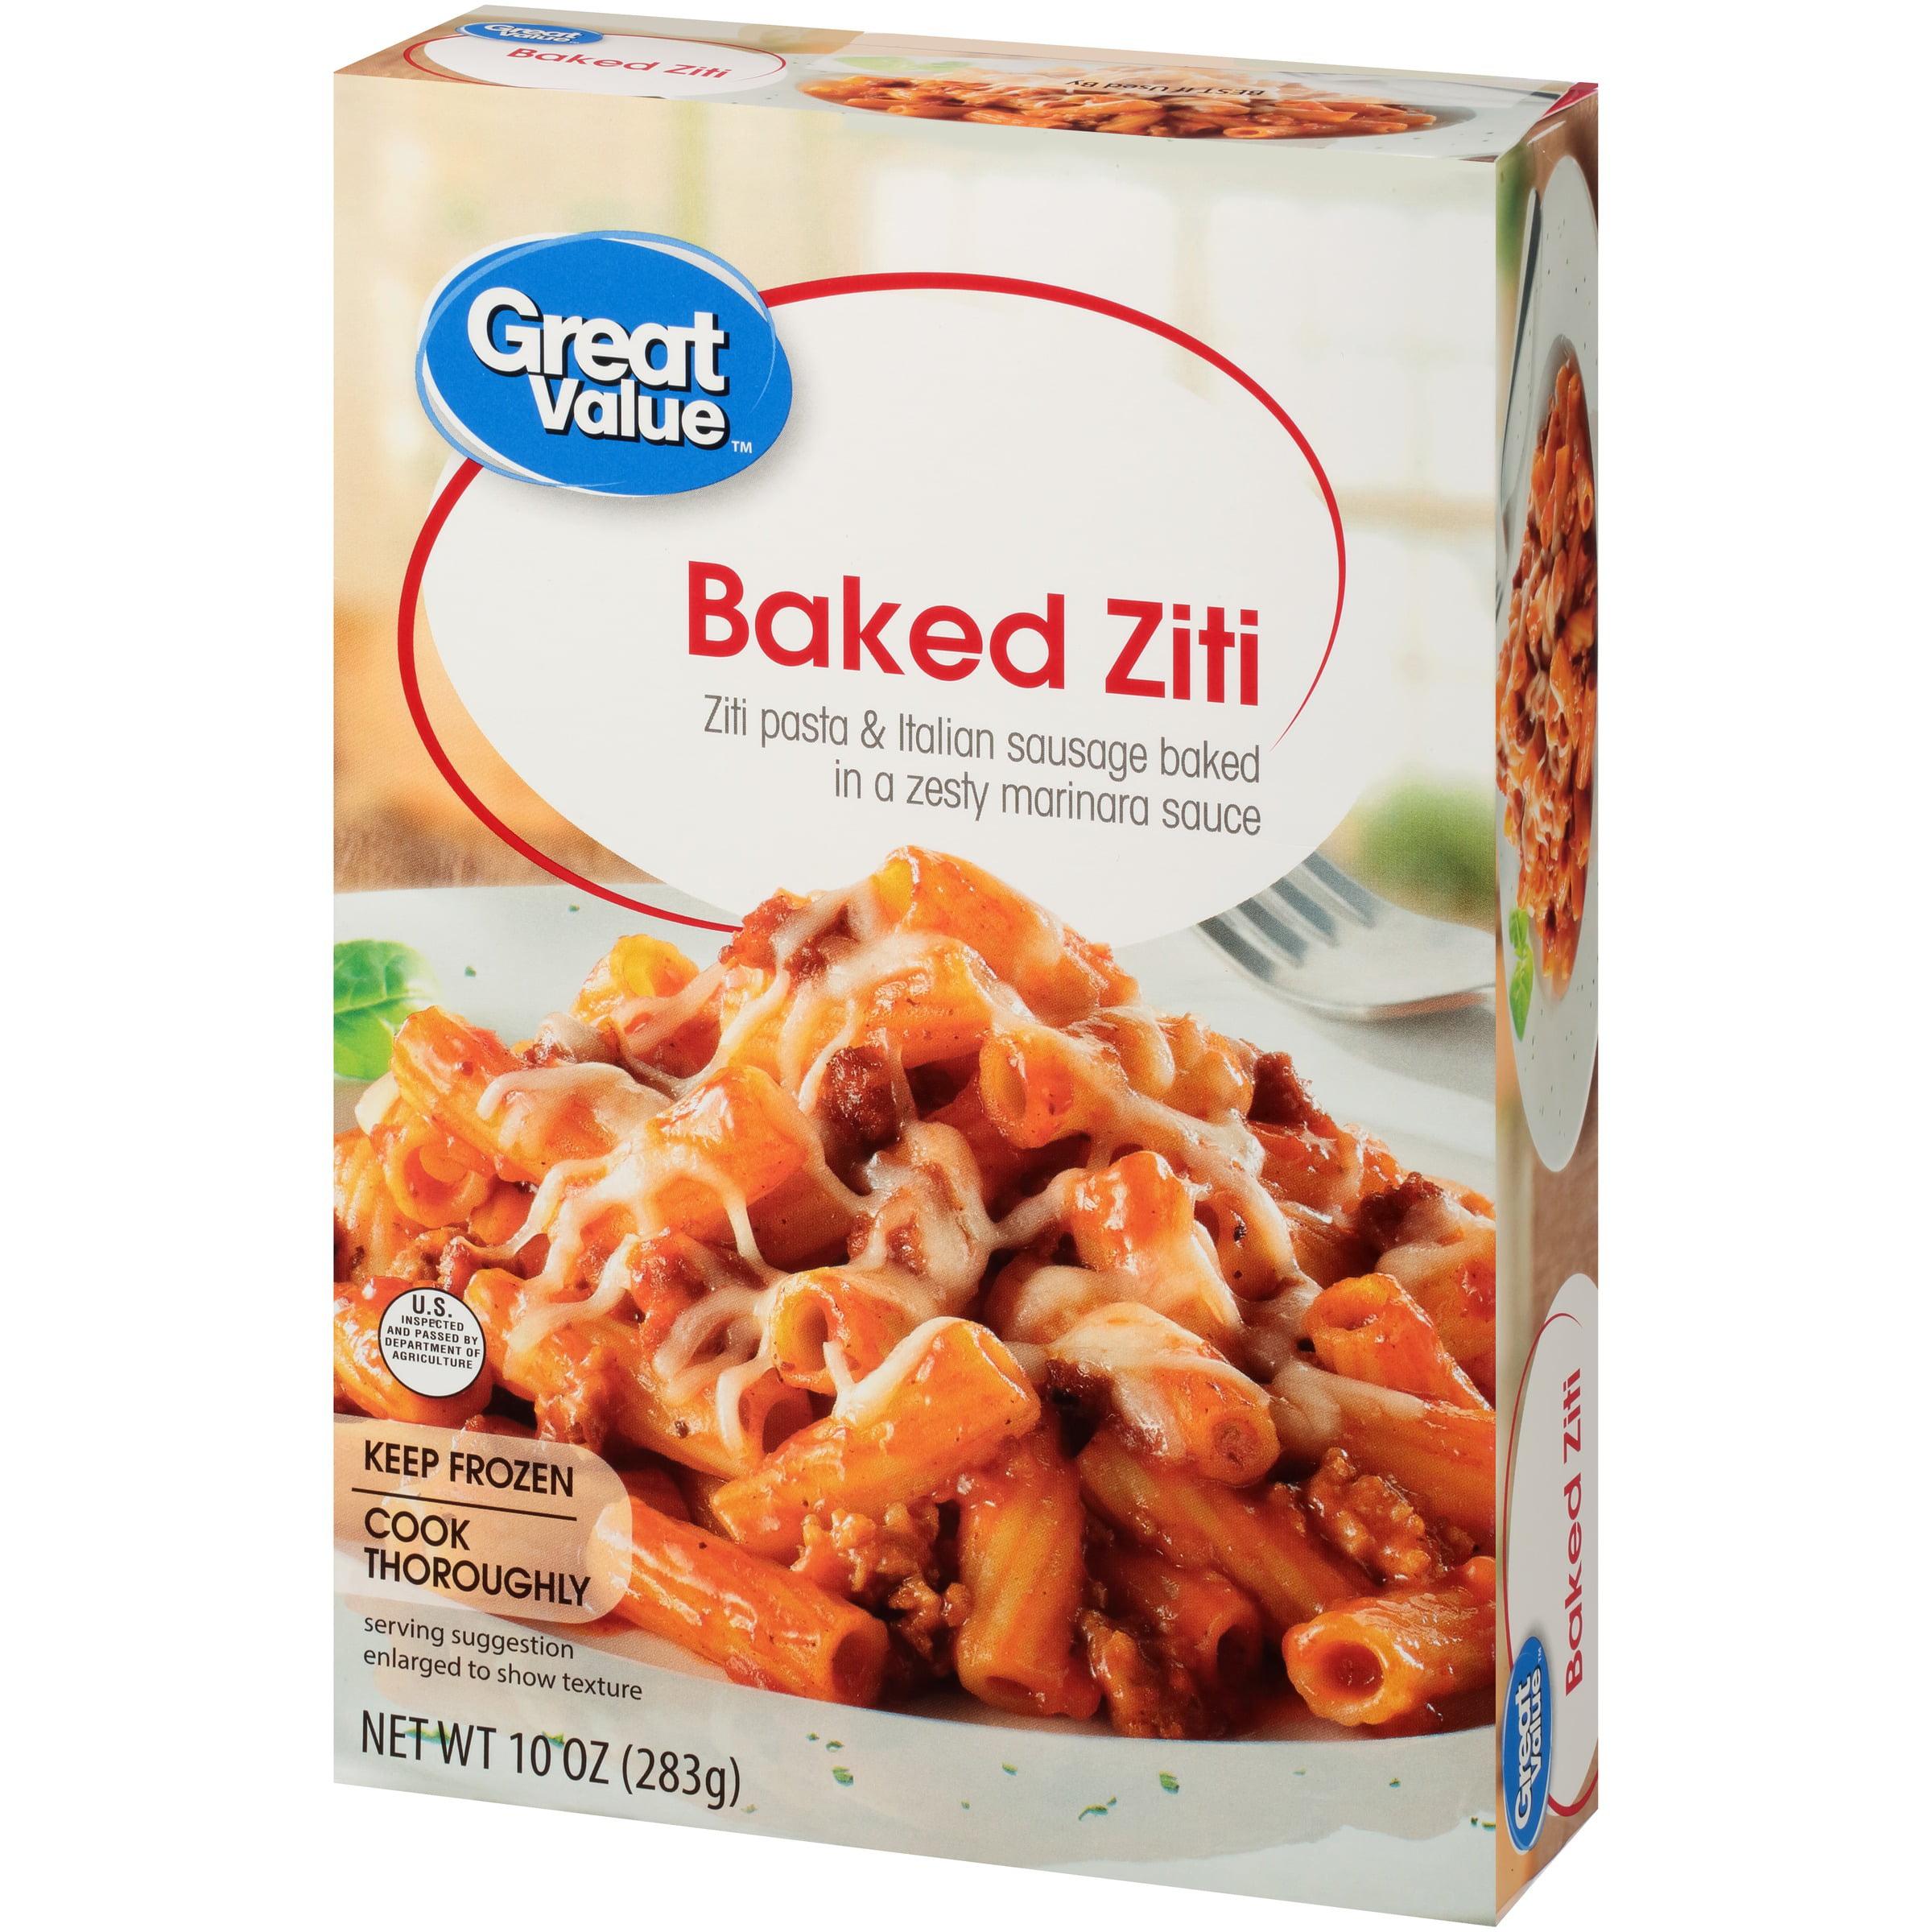 Great Value Frozen Baked Ziti, 10 oz